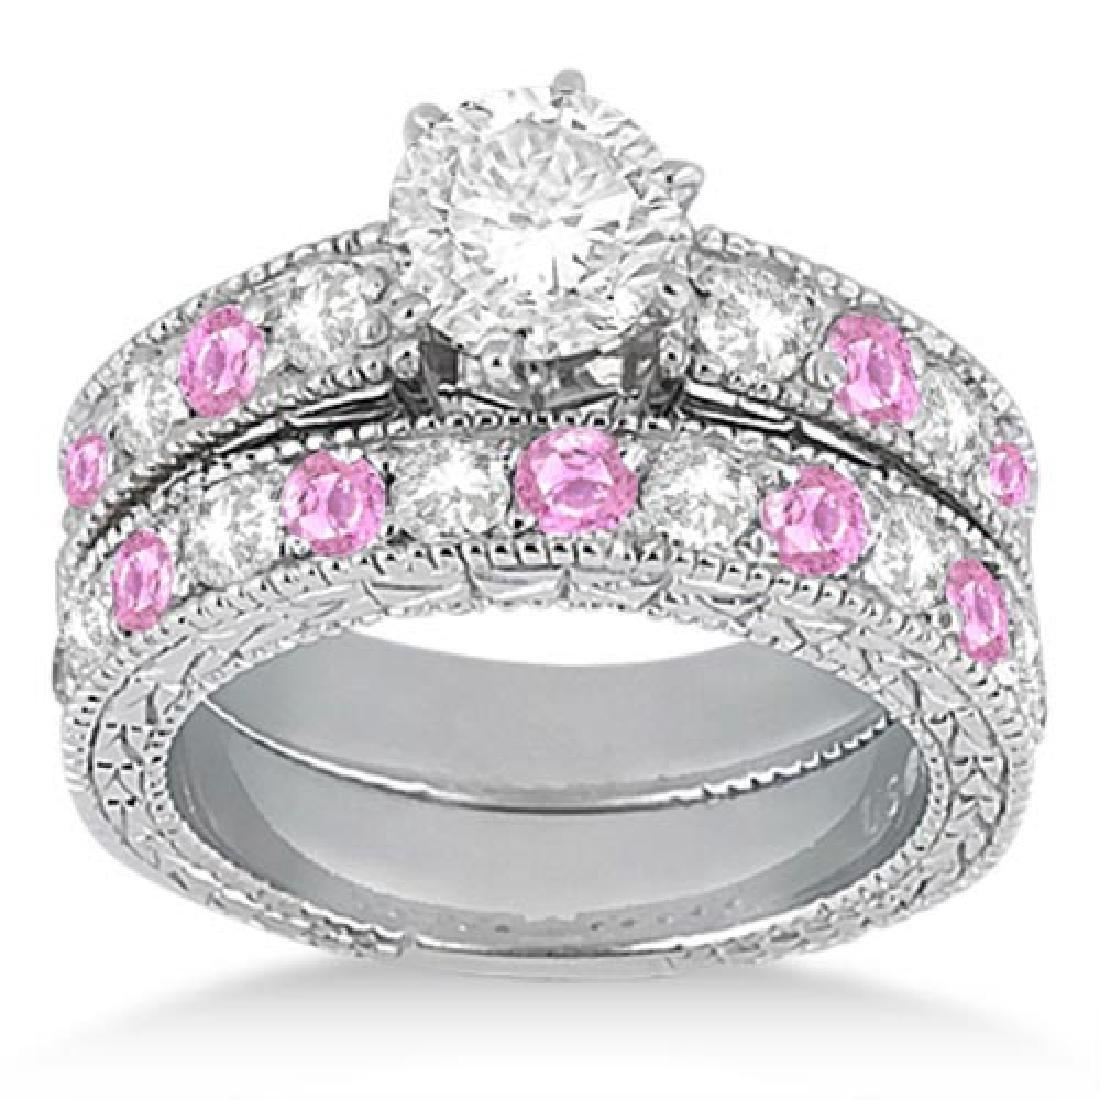 Antique Diamond and Pink Sapphire Bridal Set 14k White